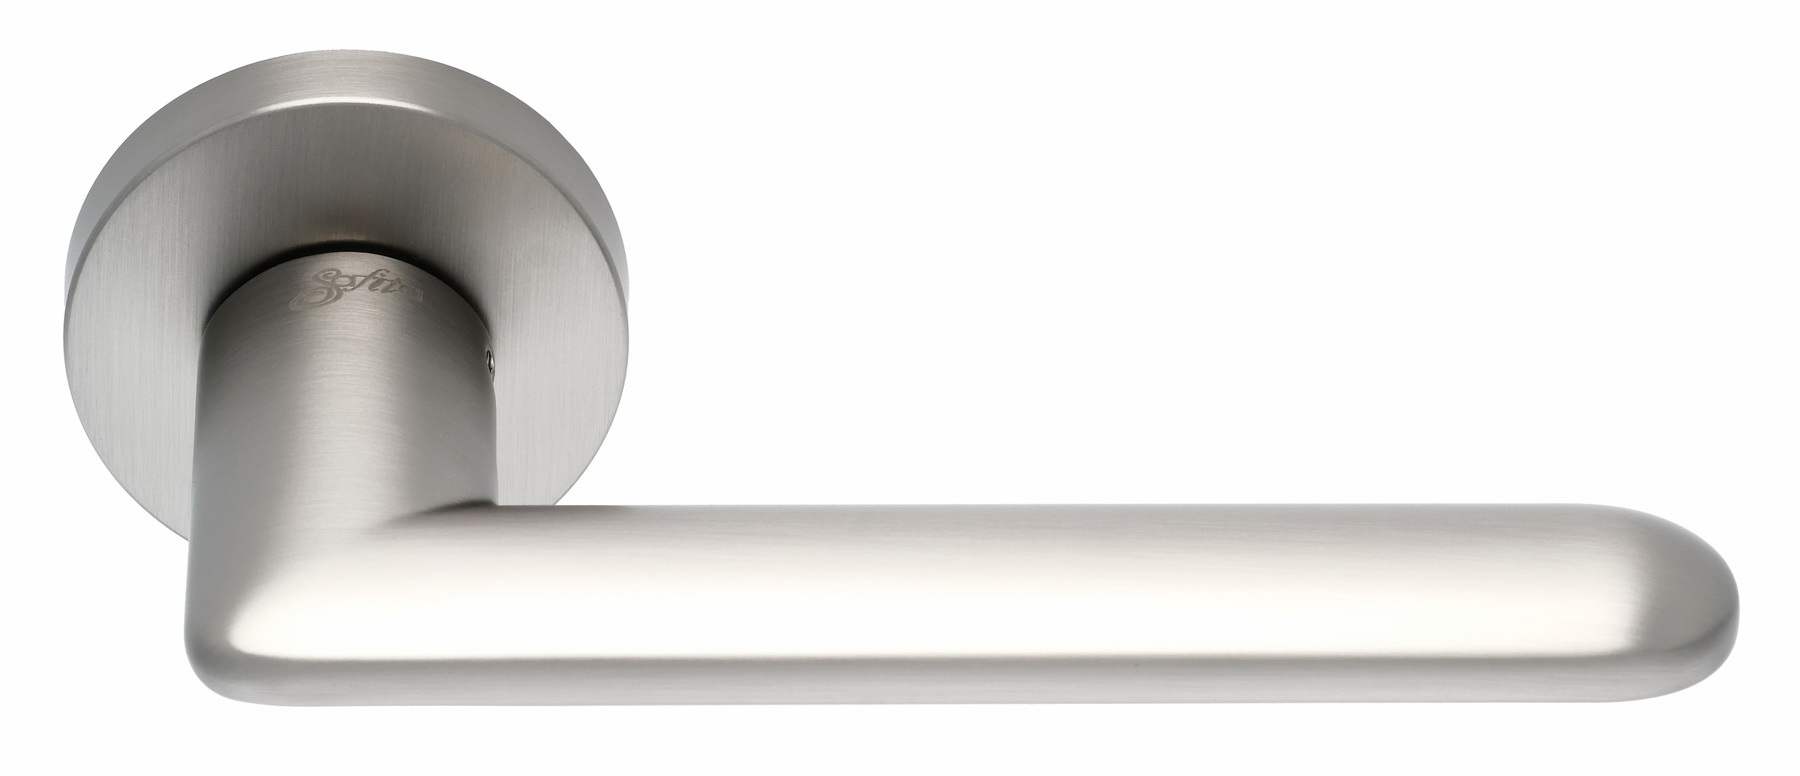 Safita COMET MSN Ручки на розетке